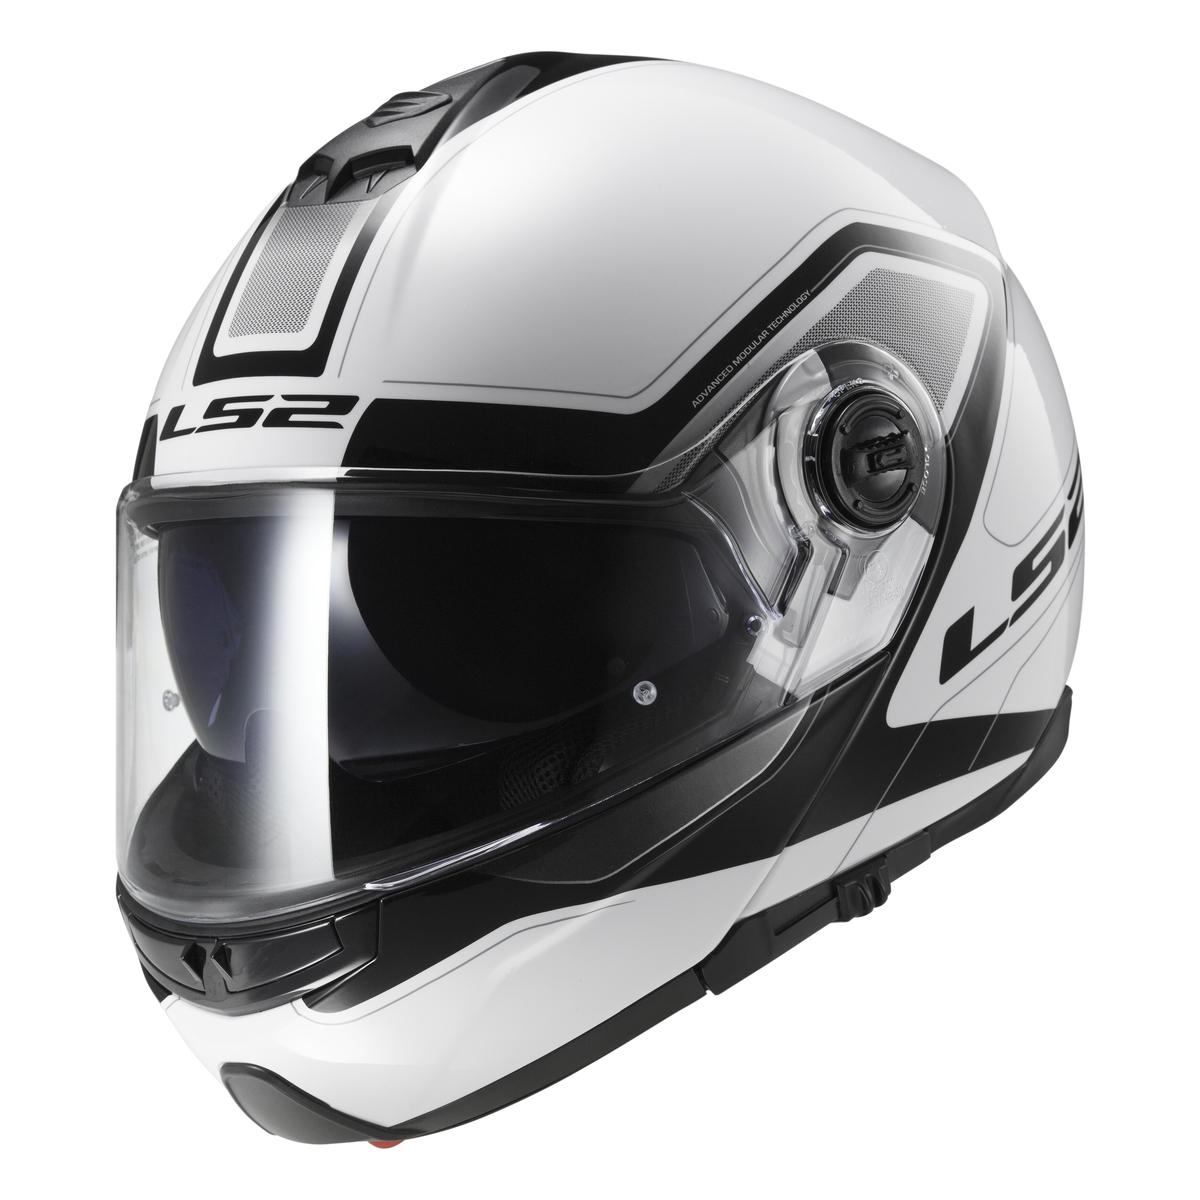 Strobe Civik Helmet